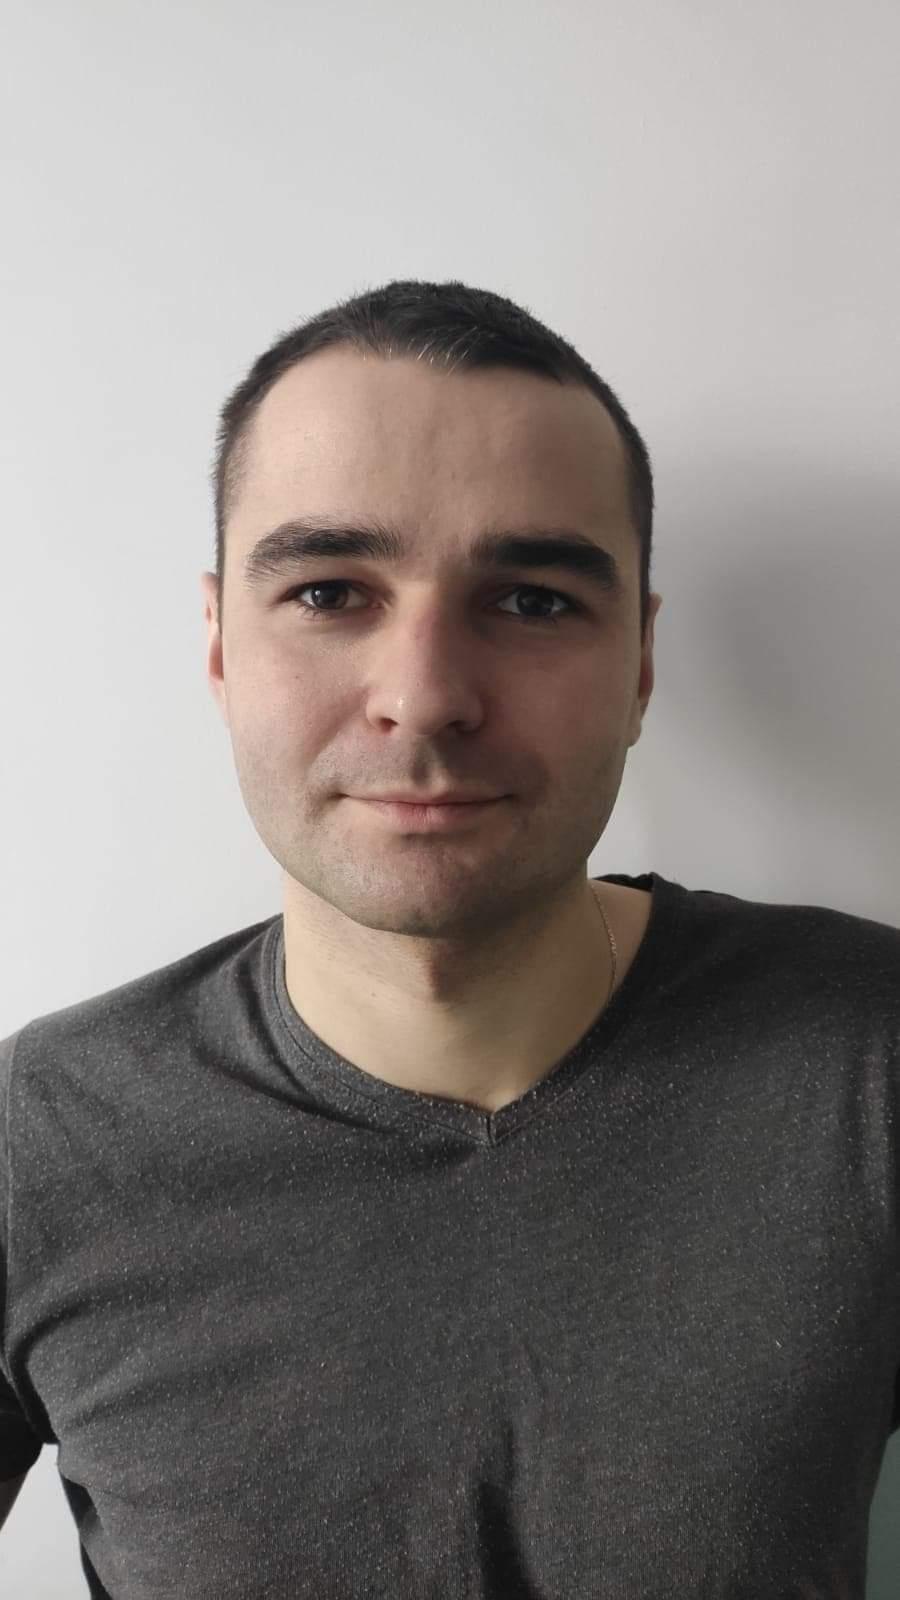 15 Damian Mazur